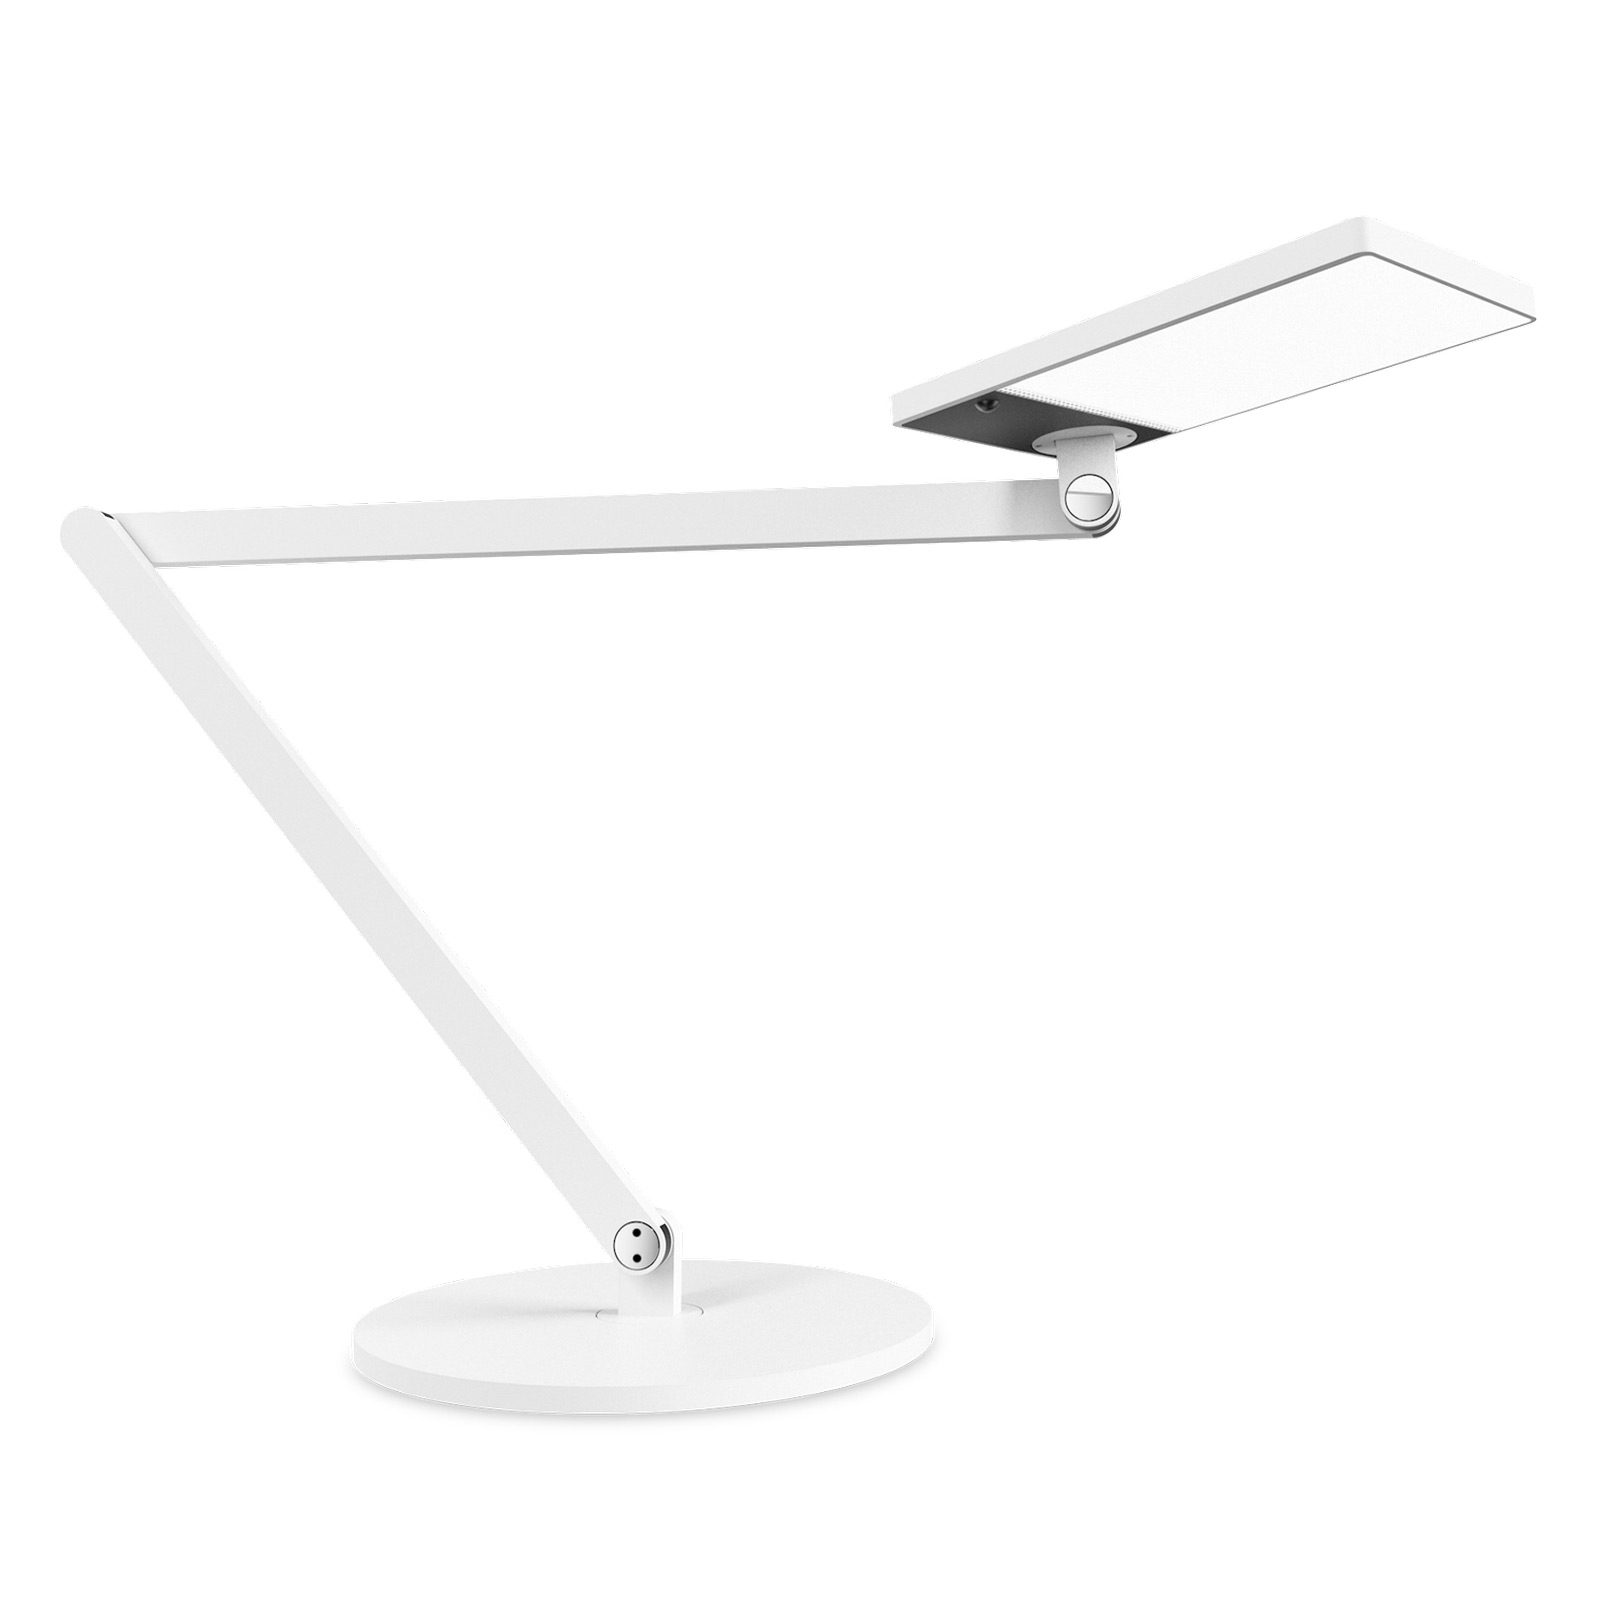 XAL Task LED-Tischlampe mit Fuß, Sensorsteuerung